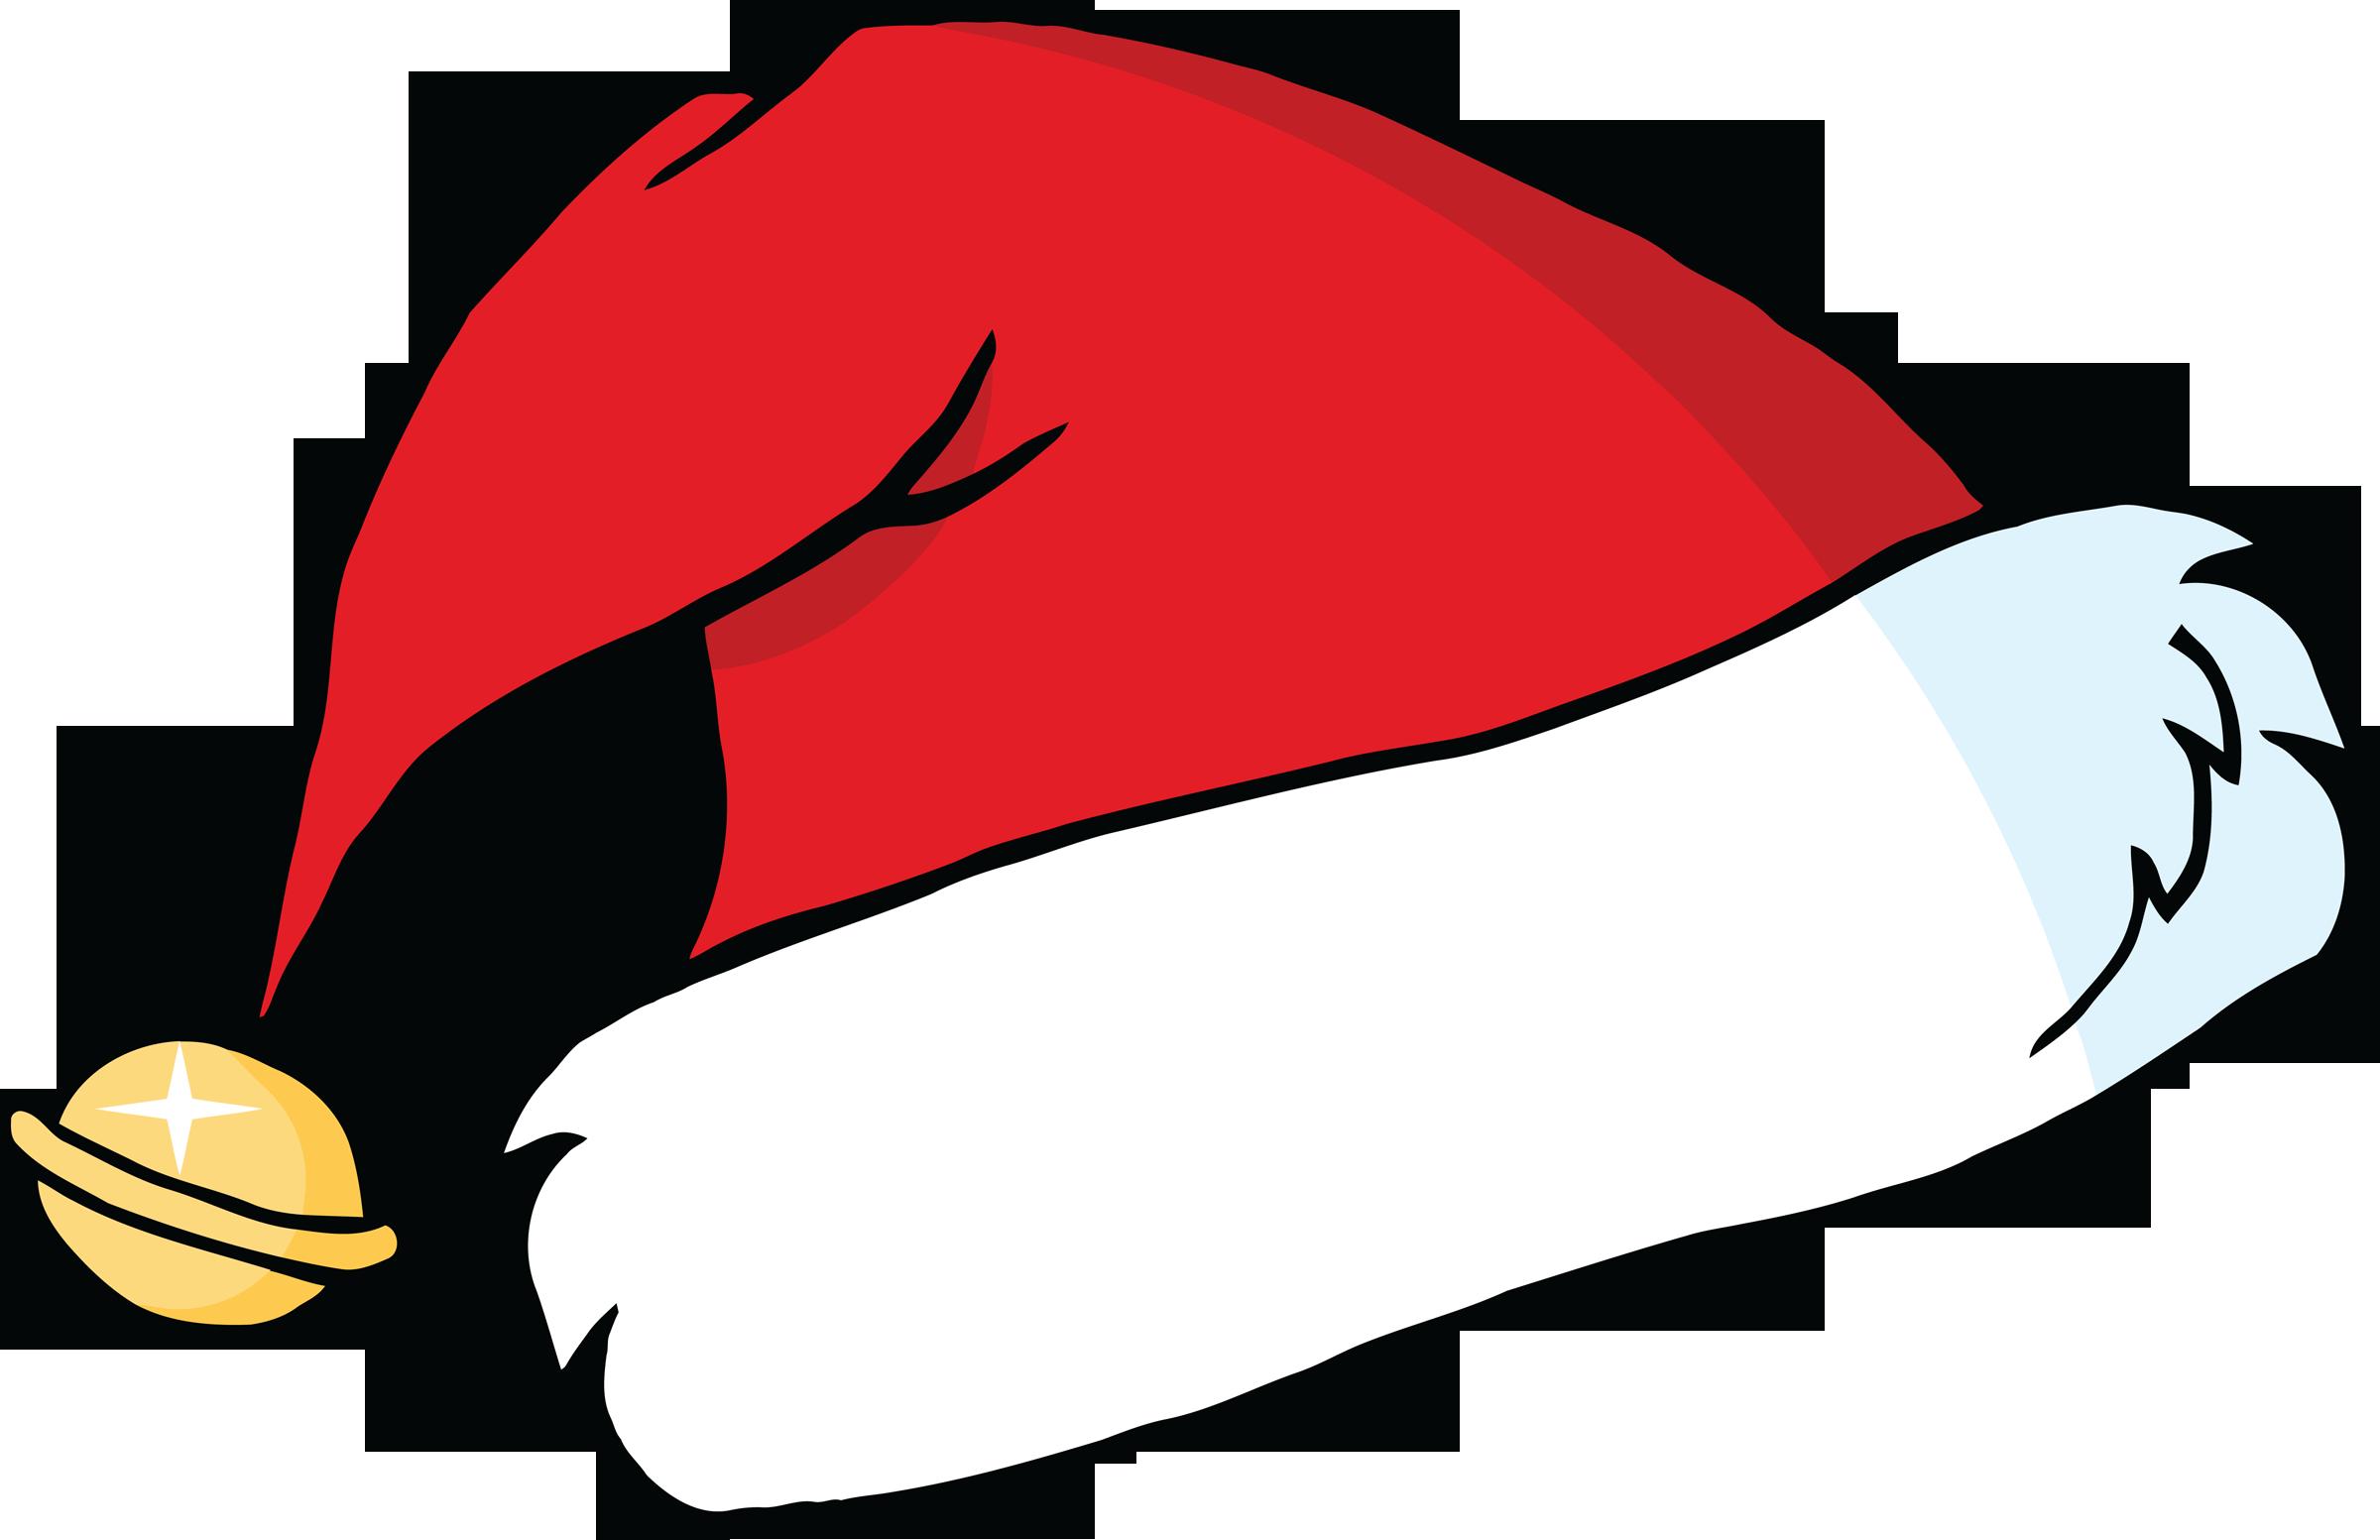 Santa claus hat clipart free image transparent download Santa claus hat clip art clipart images gallery for free ... image transparent download